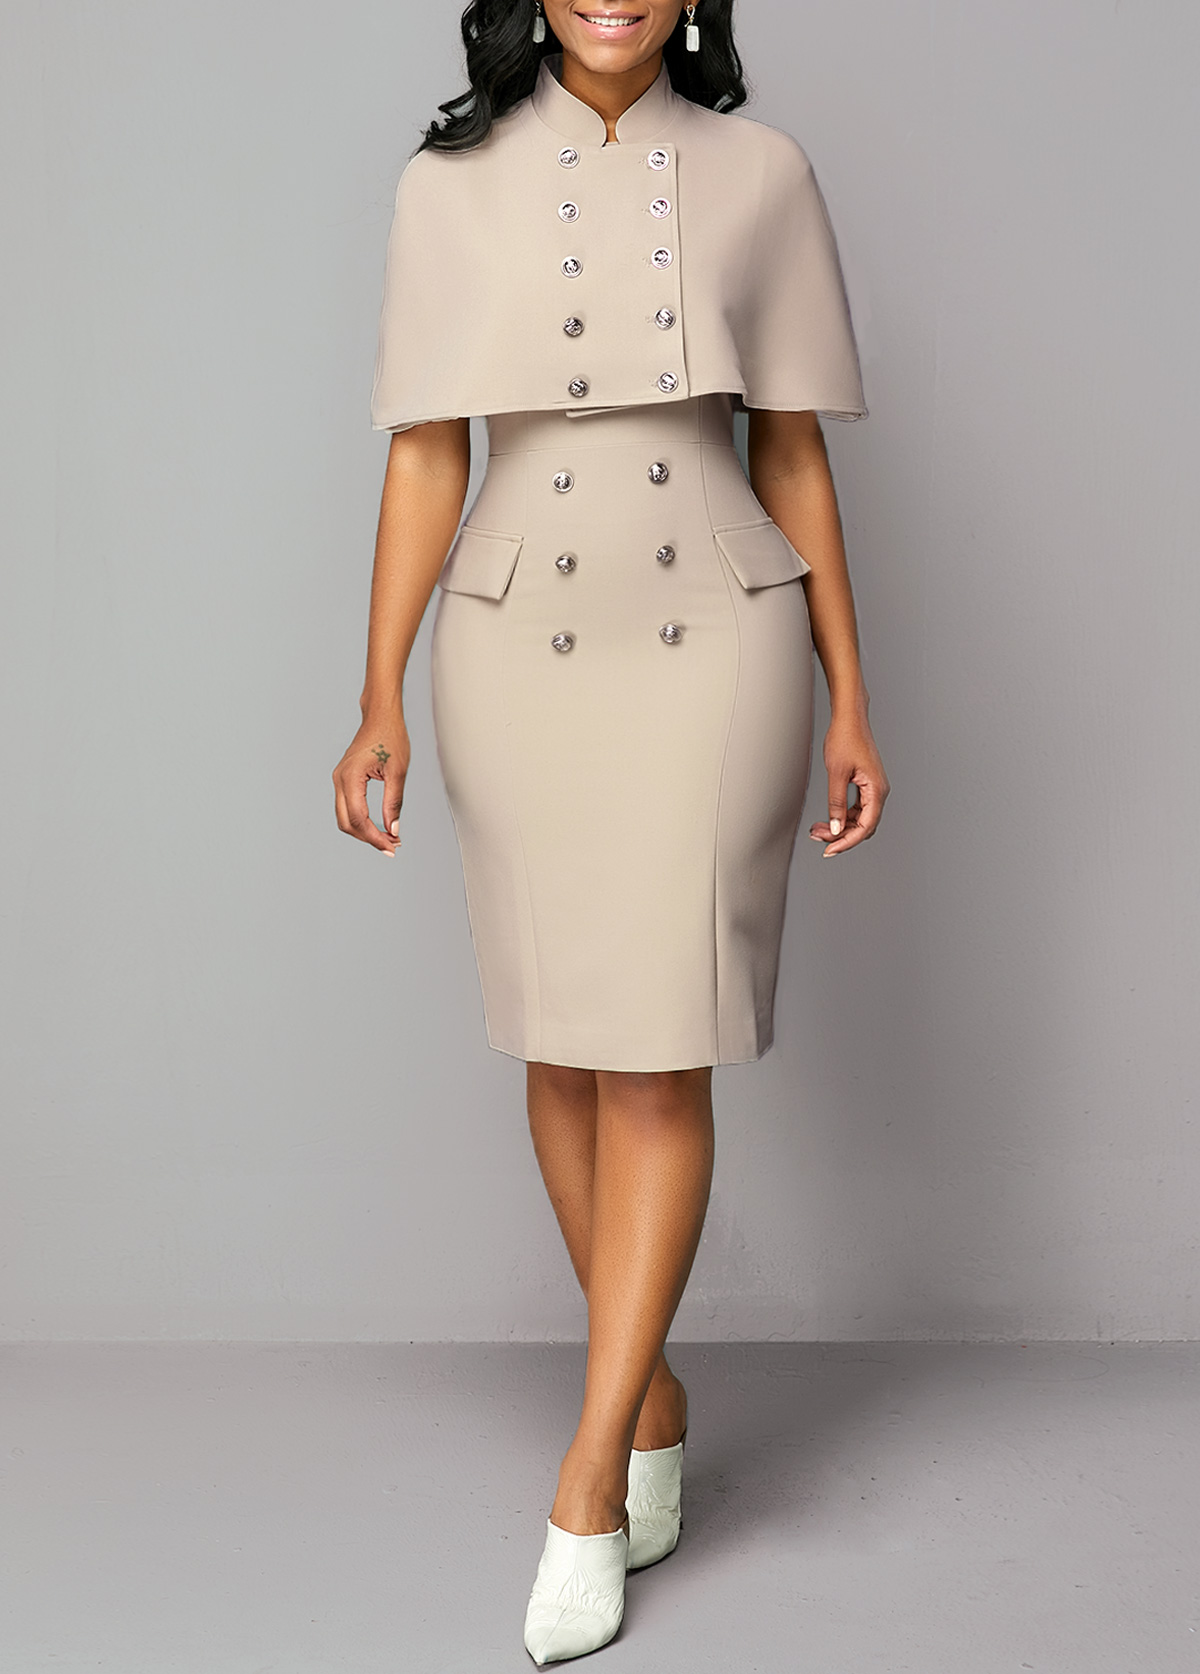 Button Detail Cap Shoulder Top and Back Slit Dress